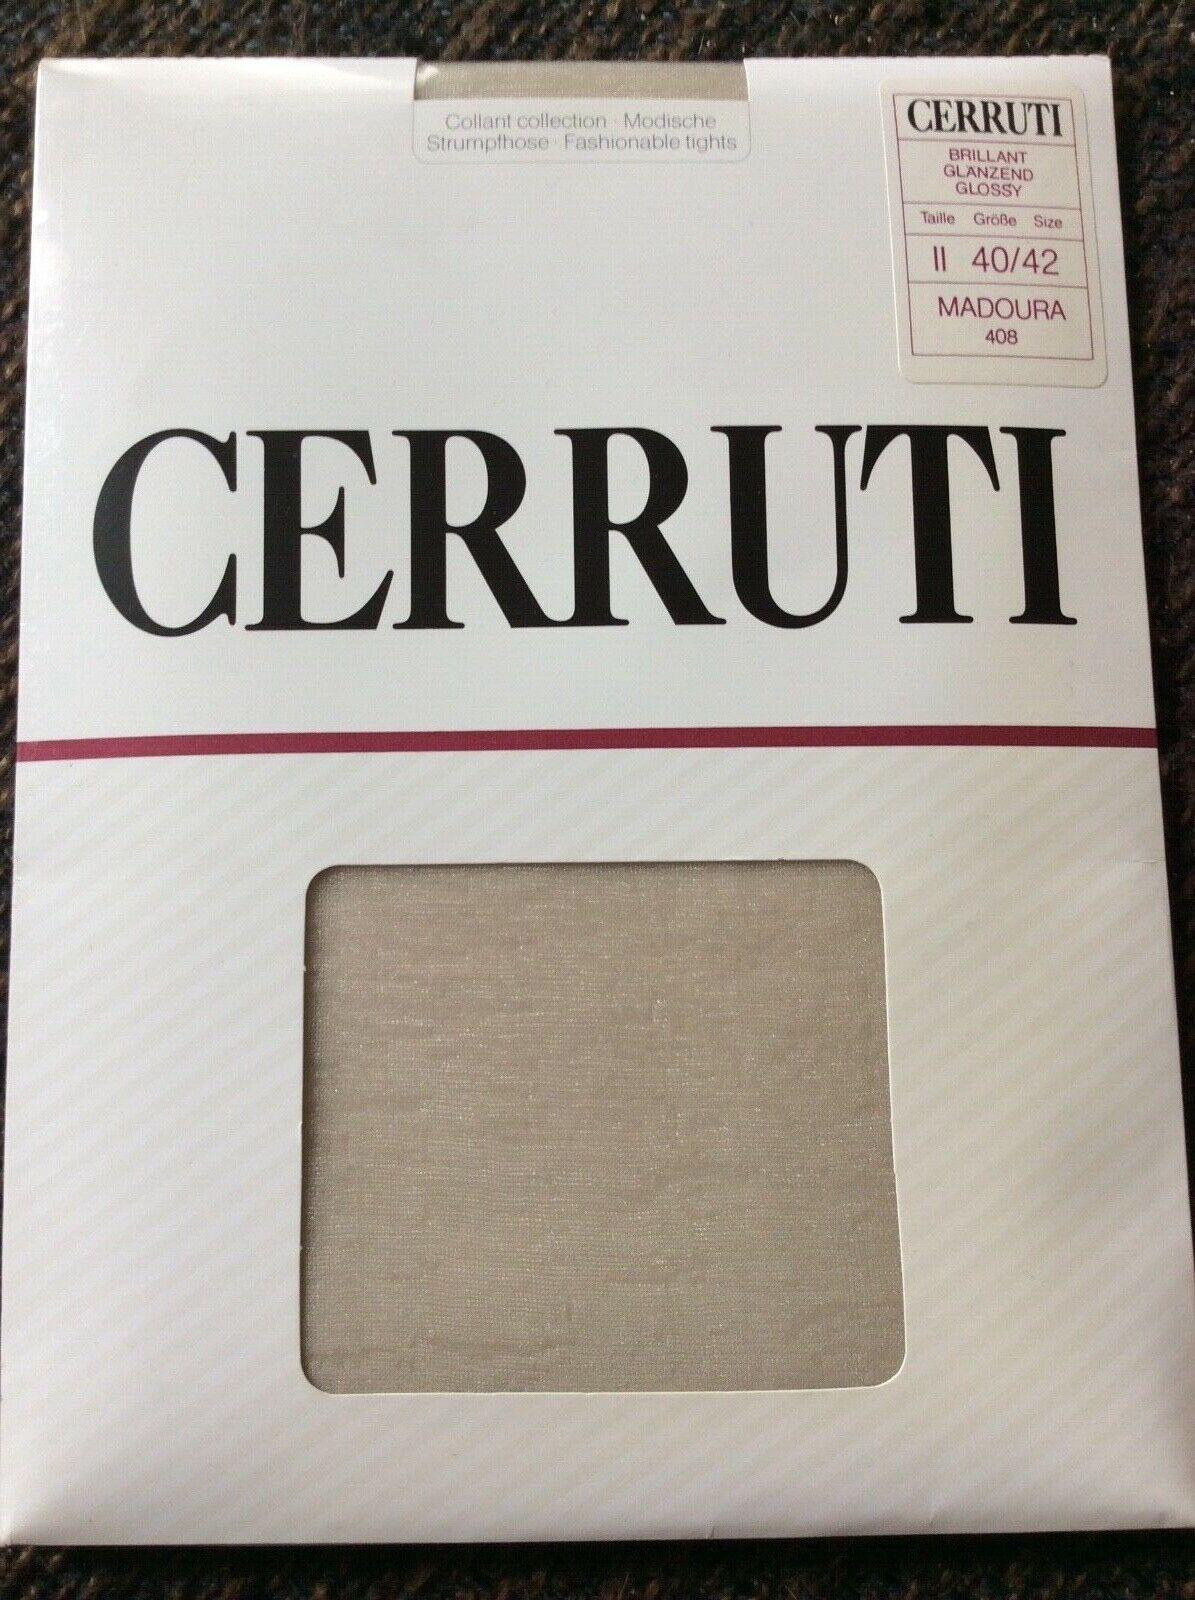 VINTAGE CERRUTI Classic Feinstrumpfhose RARITÄT Größe II Madoura 408 NEU & OVP